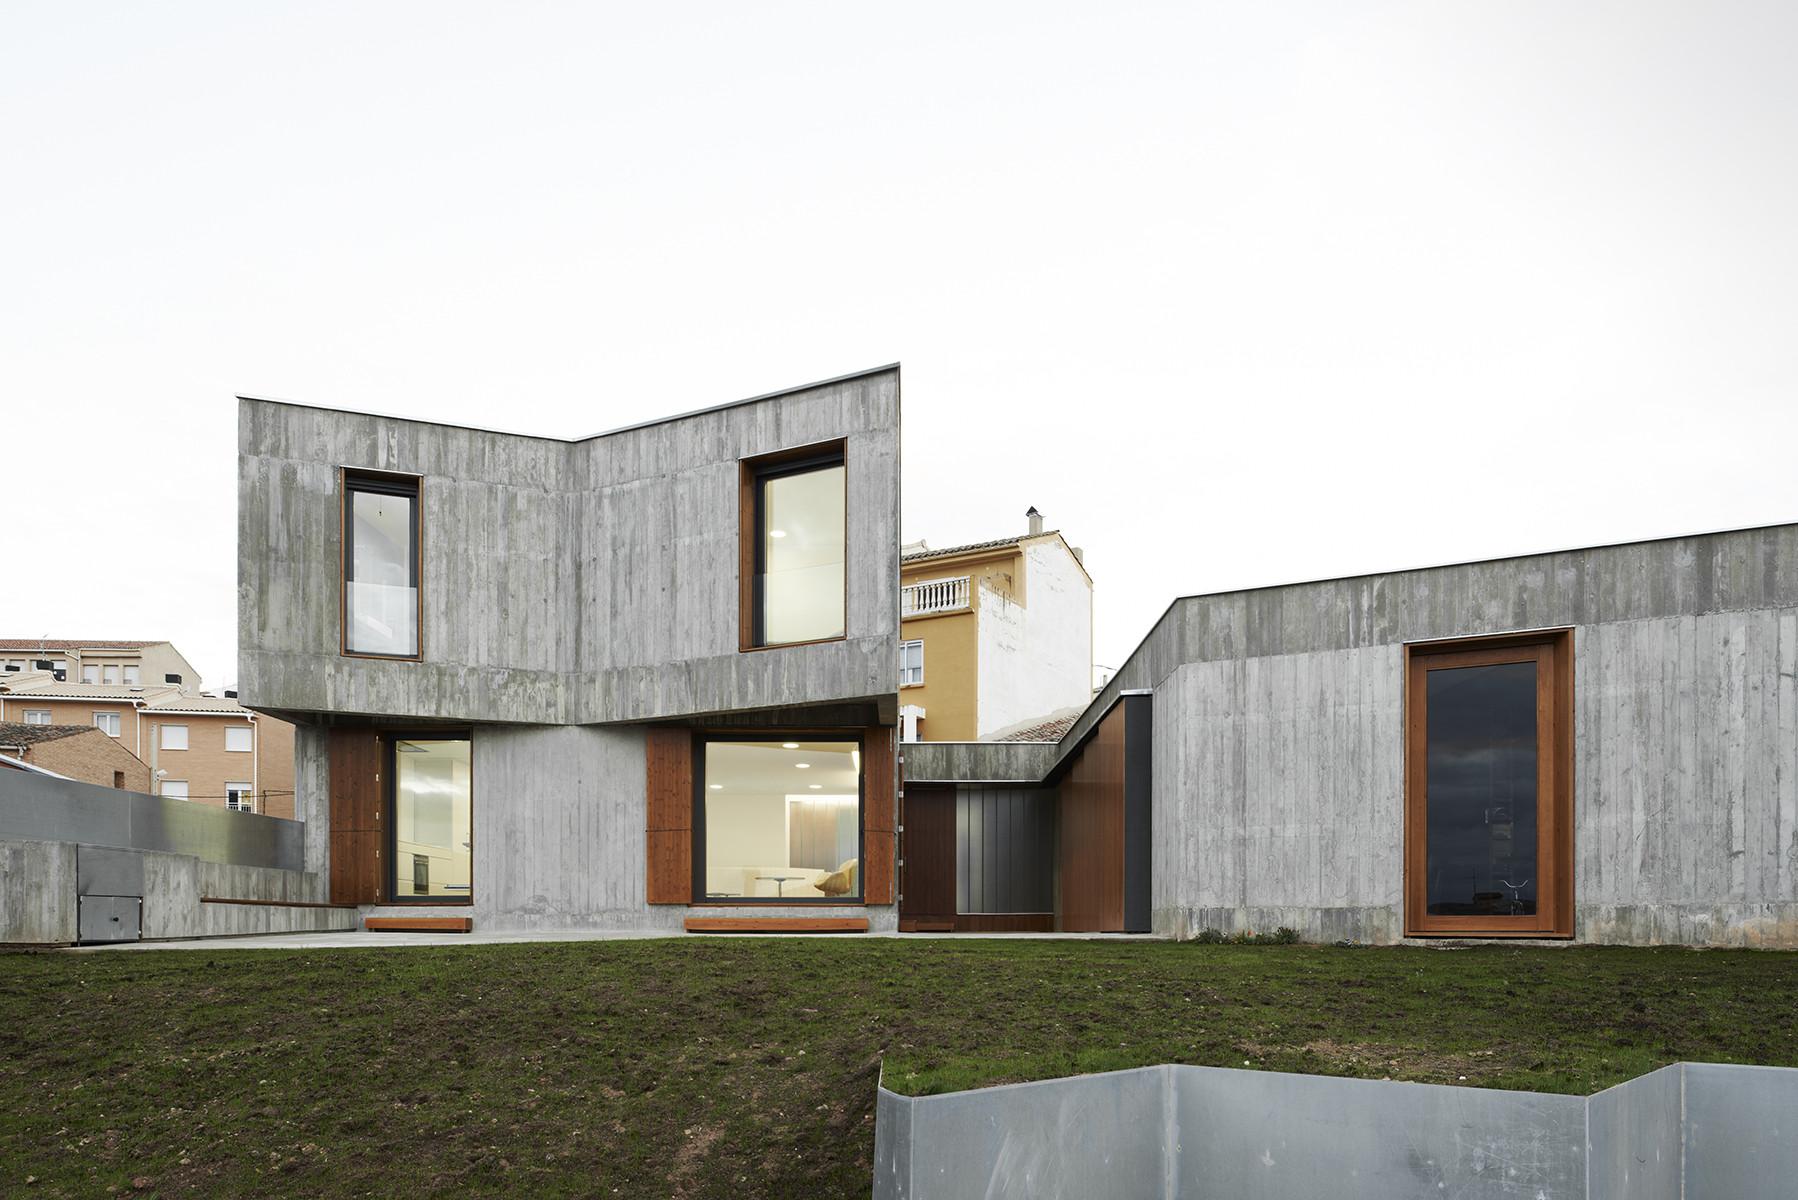 Mp house by alcolea t rrago arquitectos in navarra spain - Arquitectos navarra ...